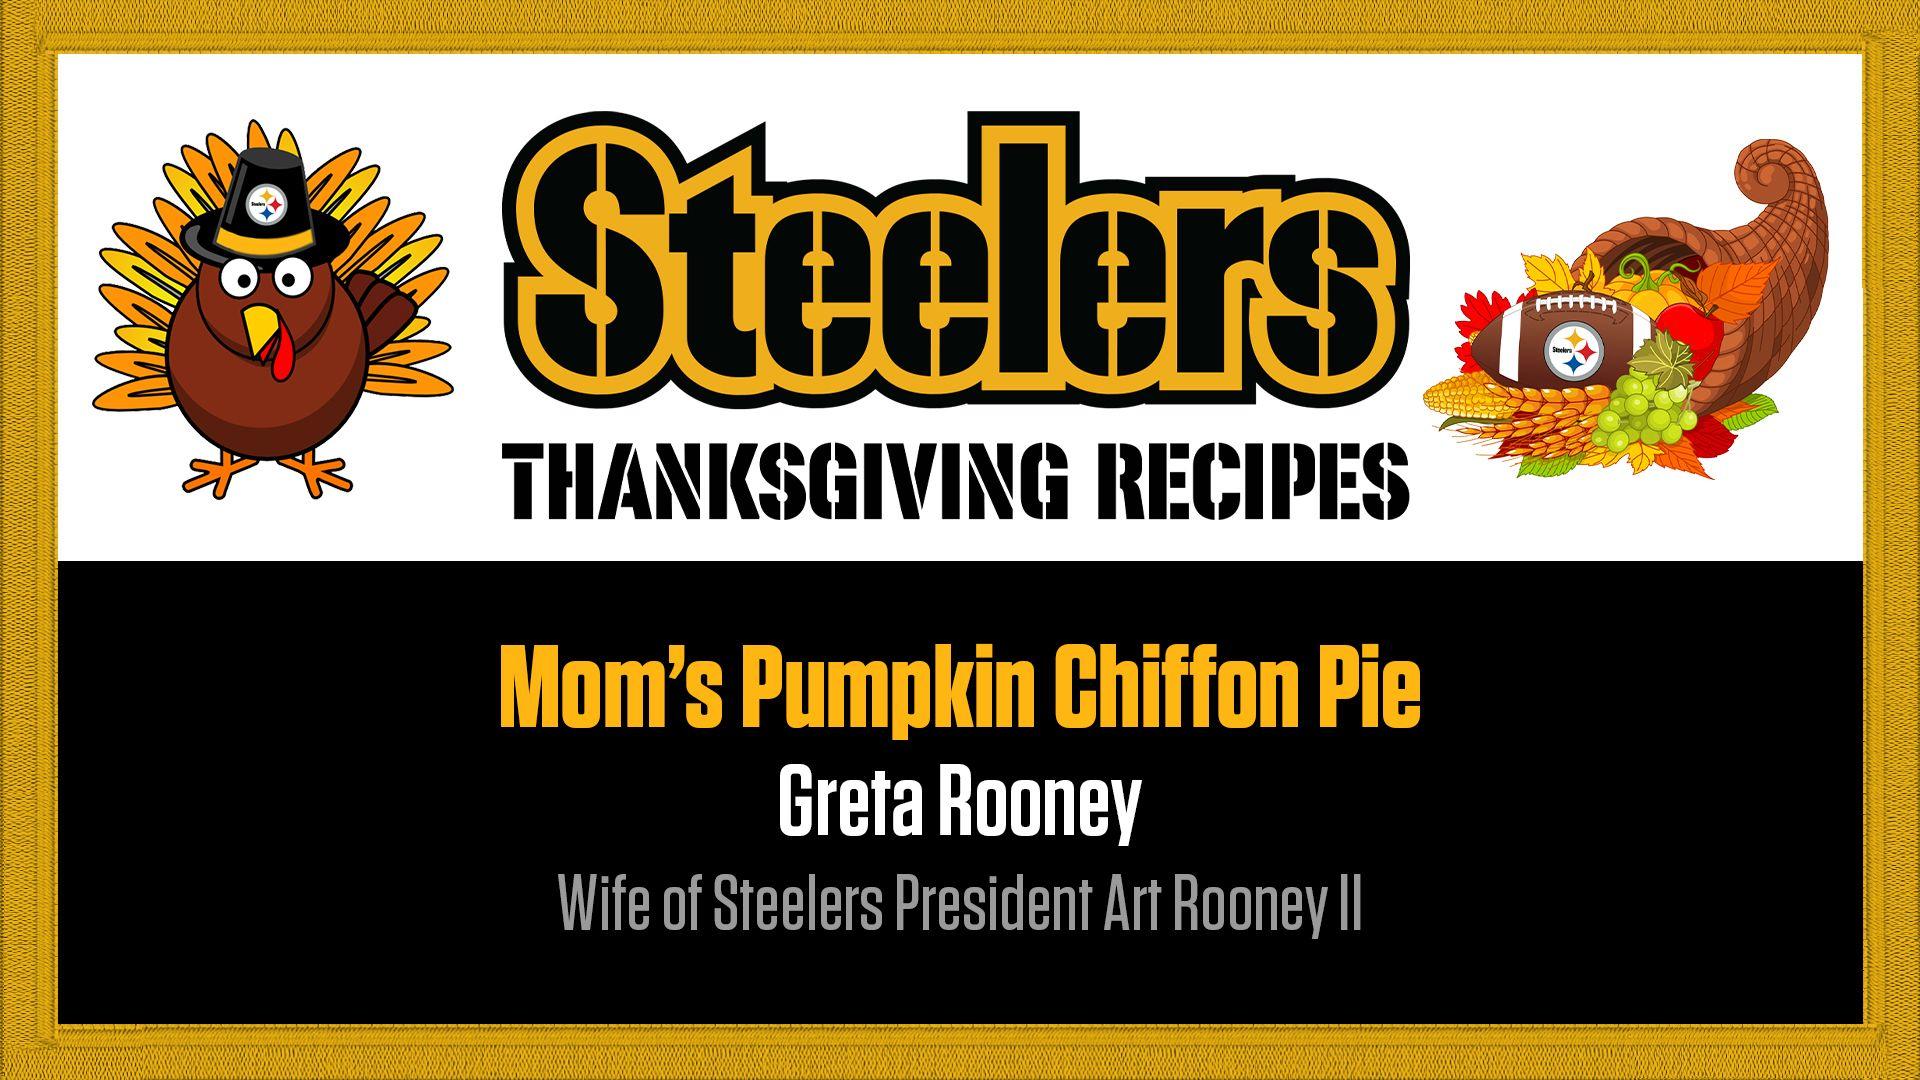 Recipe-moms pumpkin chiffon pie_greta rooney